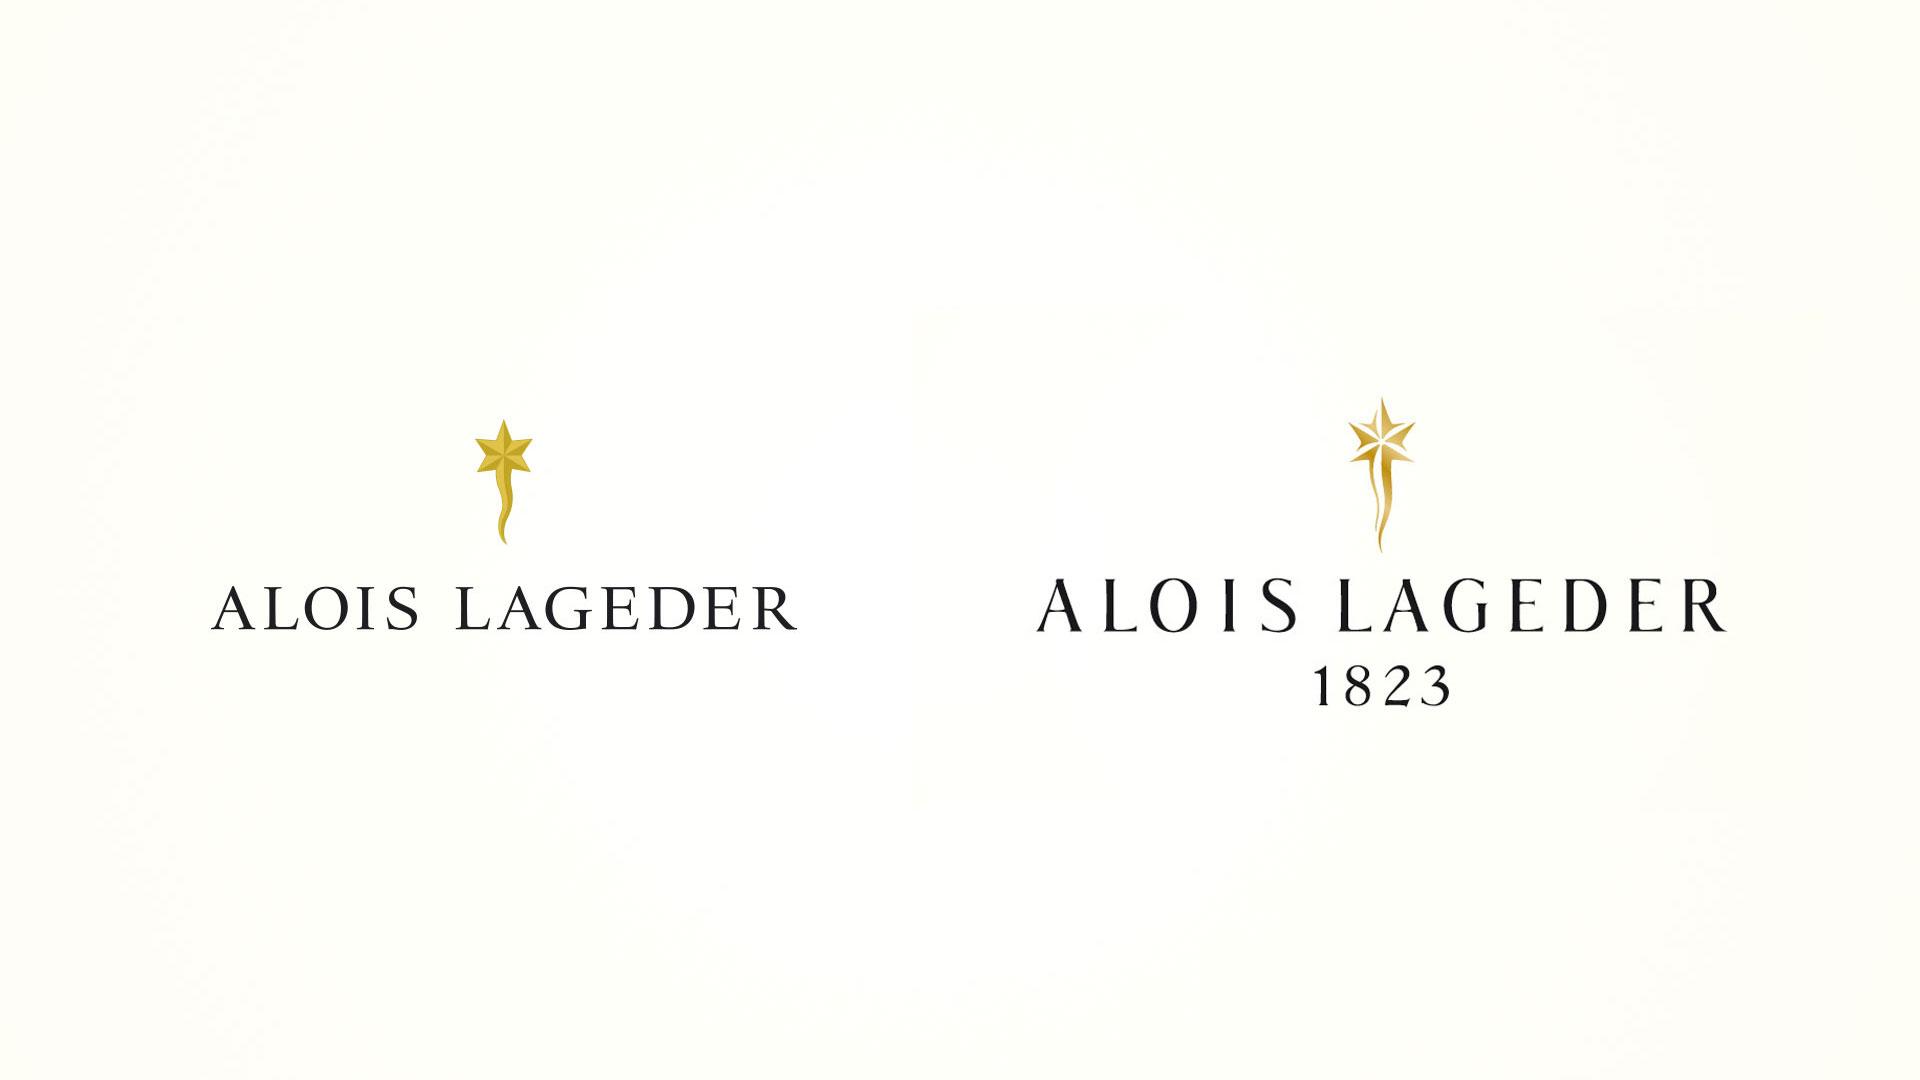 Alois Lageder brand restyling